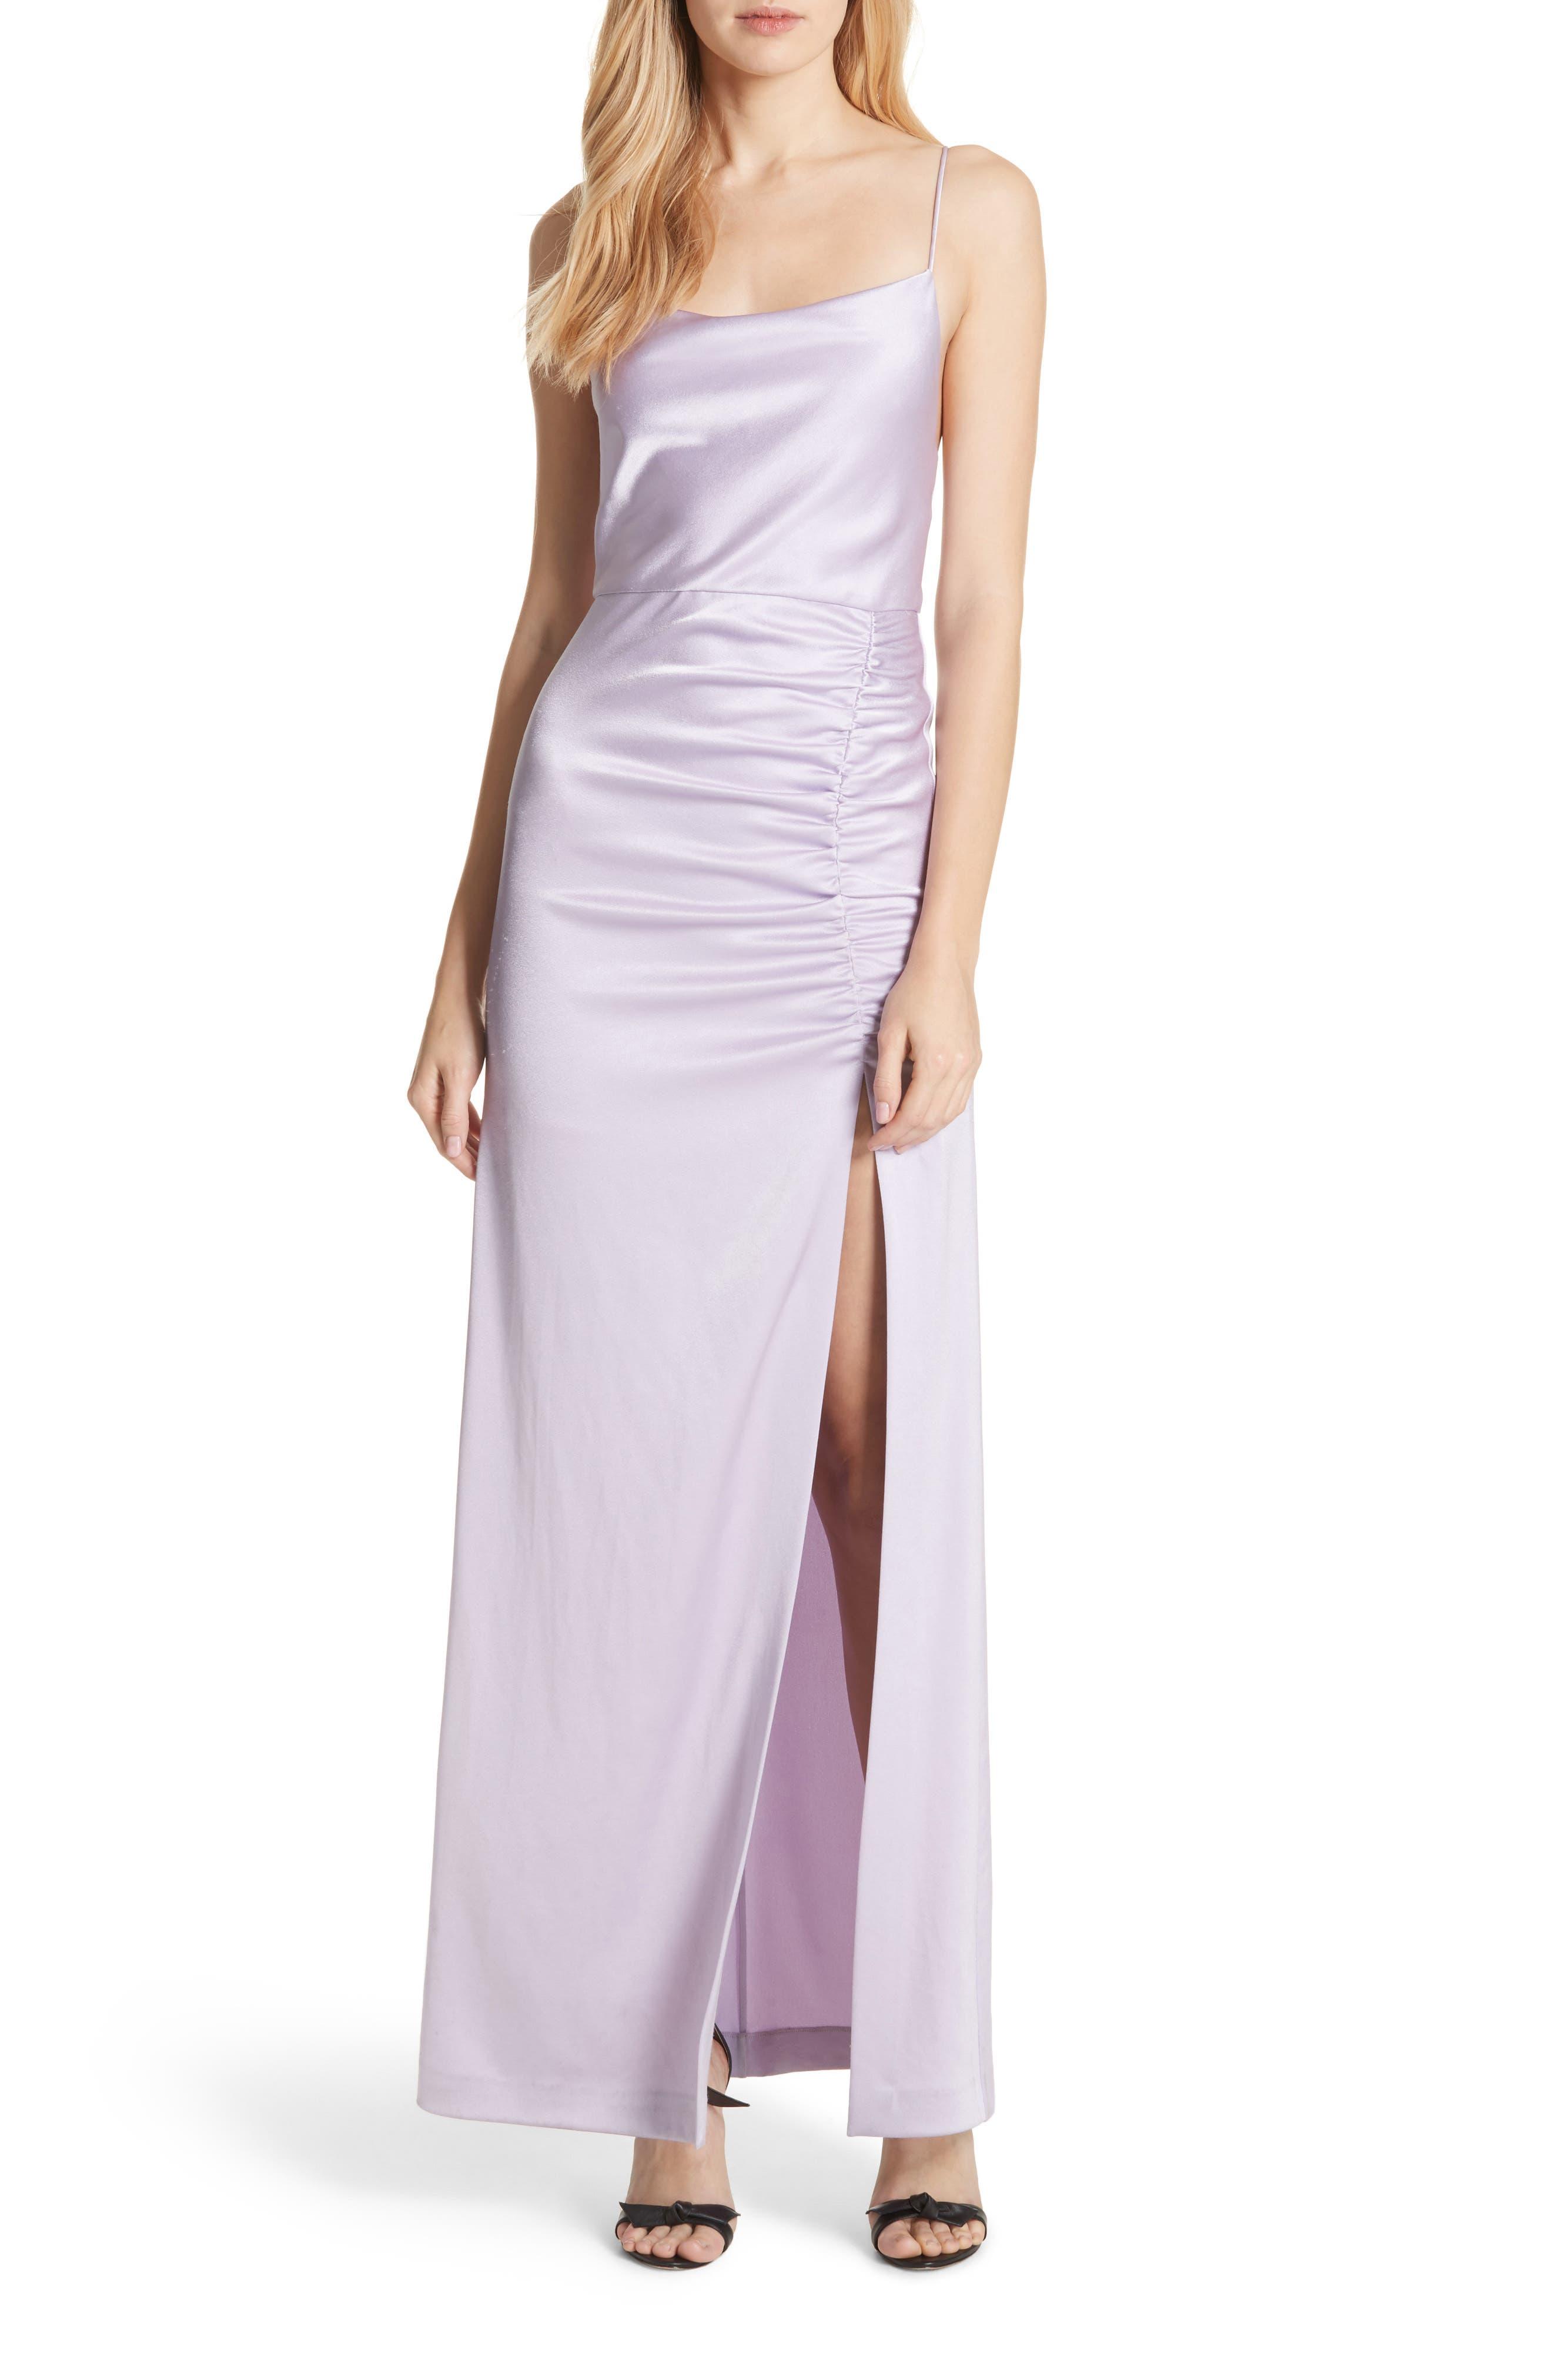 Alice + Olivia Diana Slit Front Maxi Dress